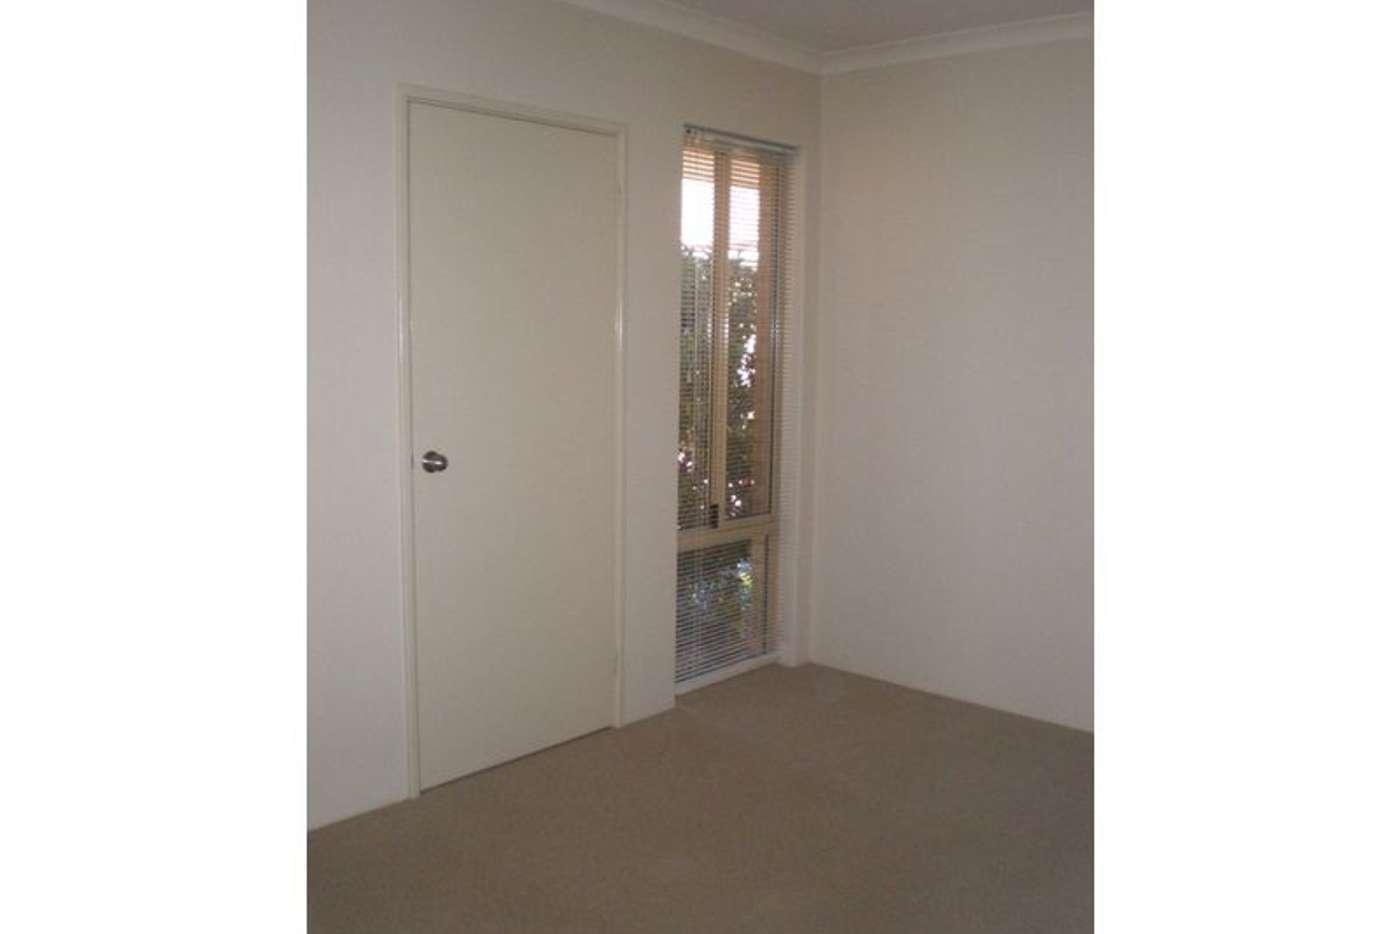 Sixth view of Homely villa listing, D/13 Selina Street, Innaloo WA 6018